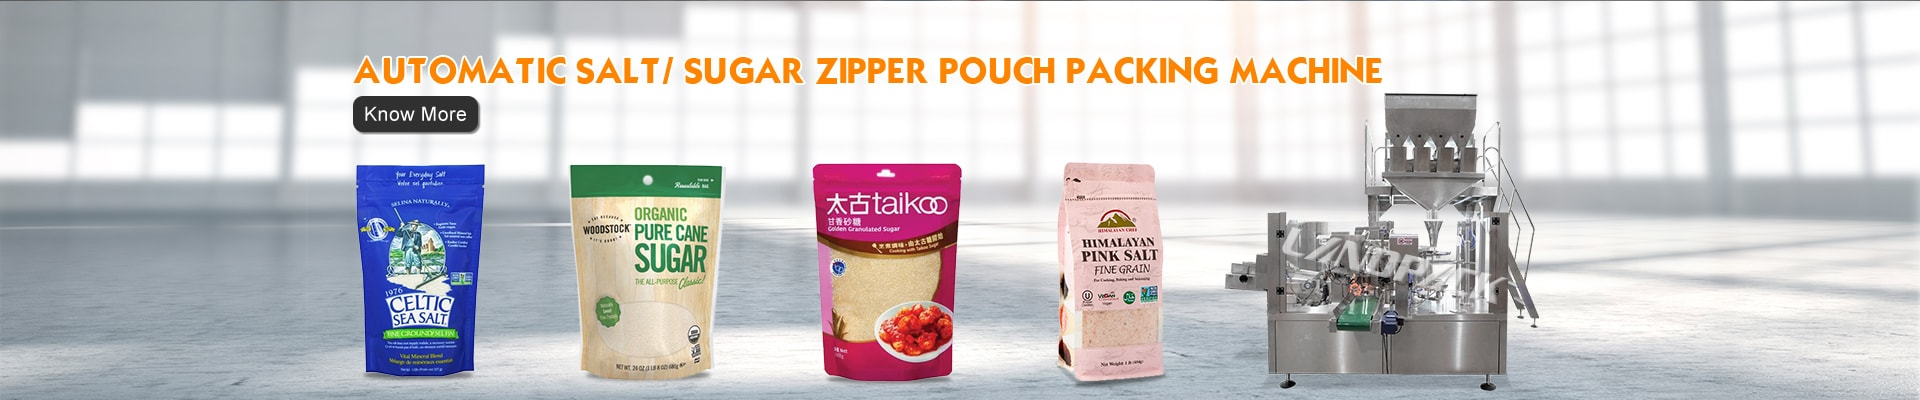 Sugar/Salt Packing Machine